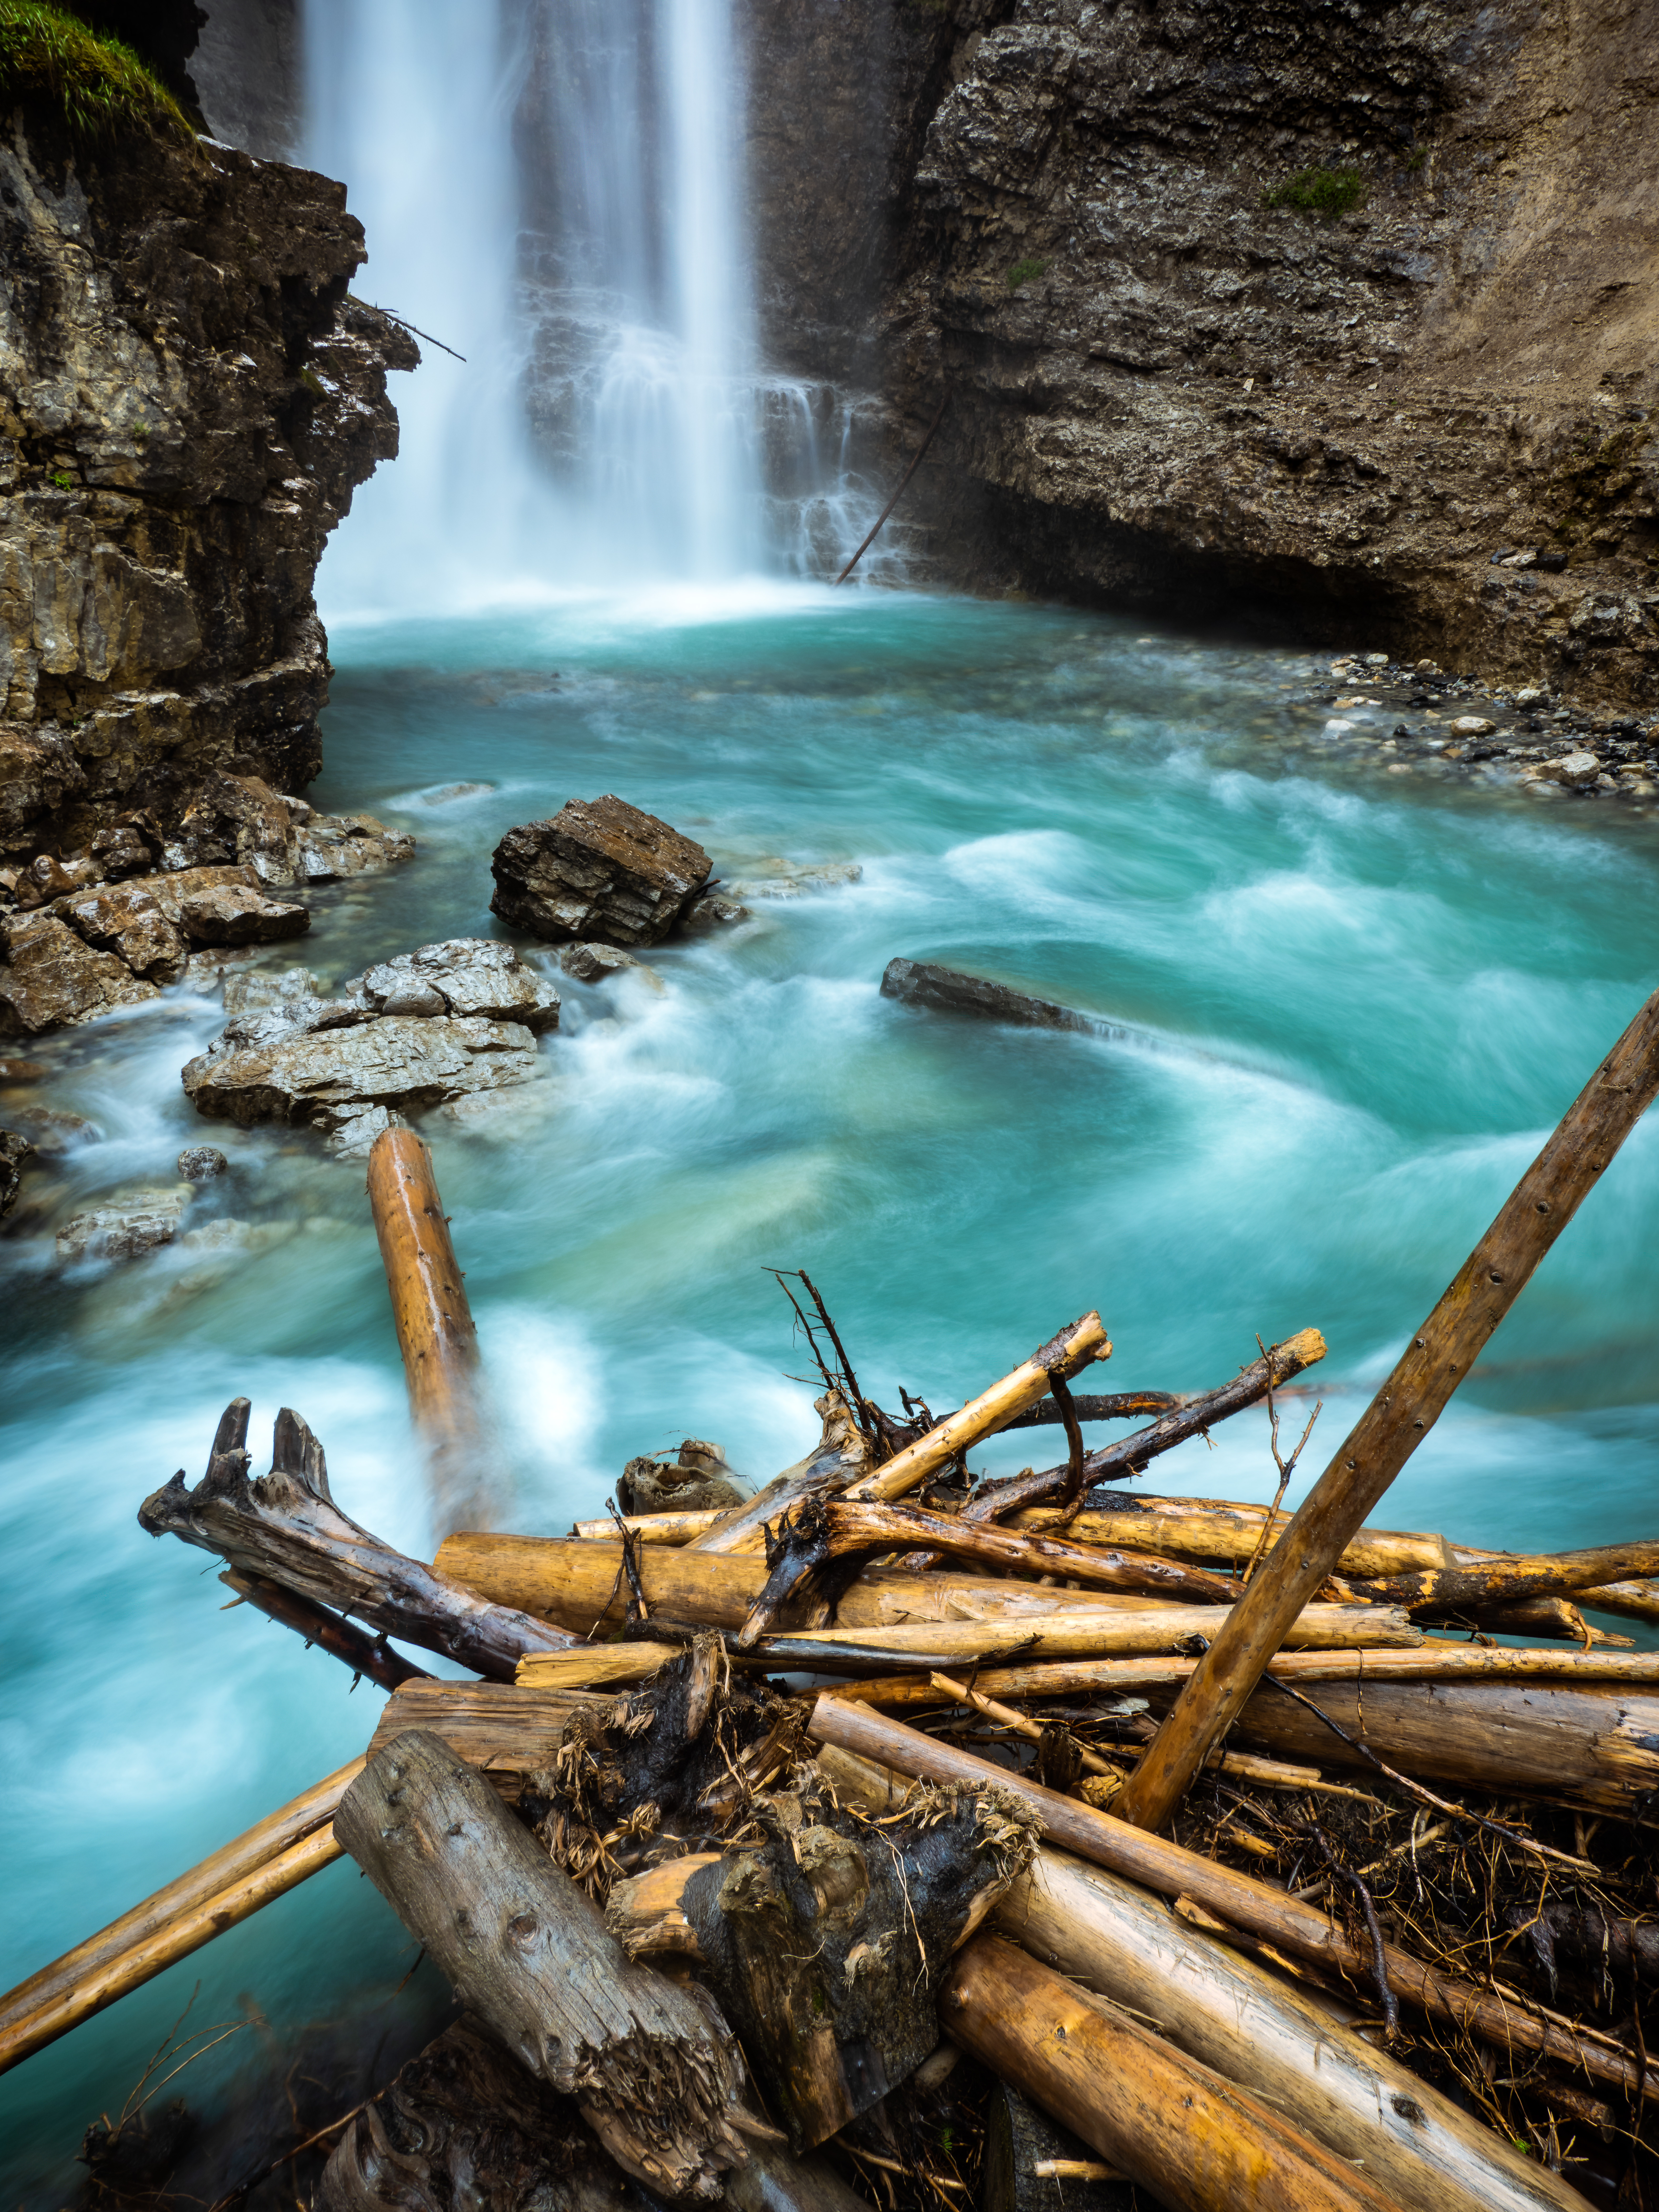 The falls at Johnston Canyon, near Banff, Alberta, Canada